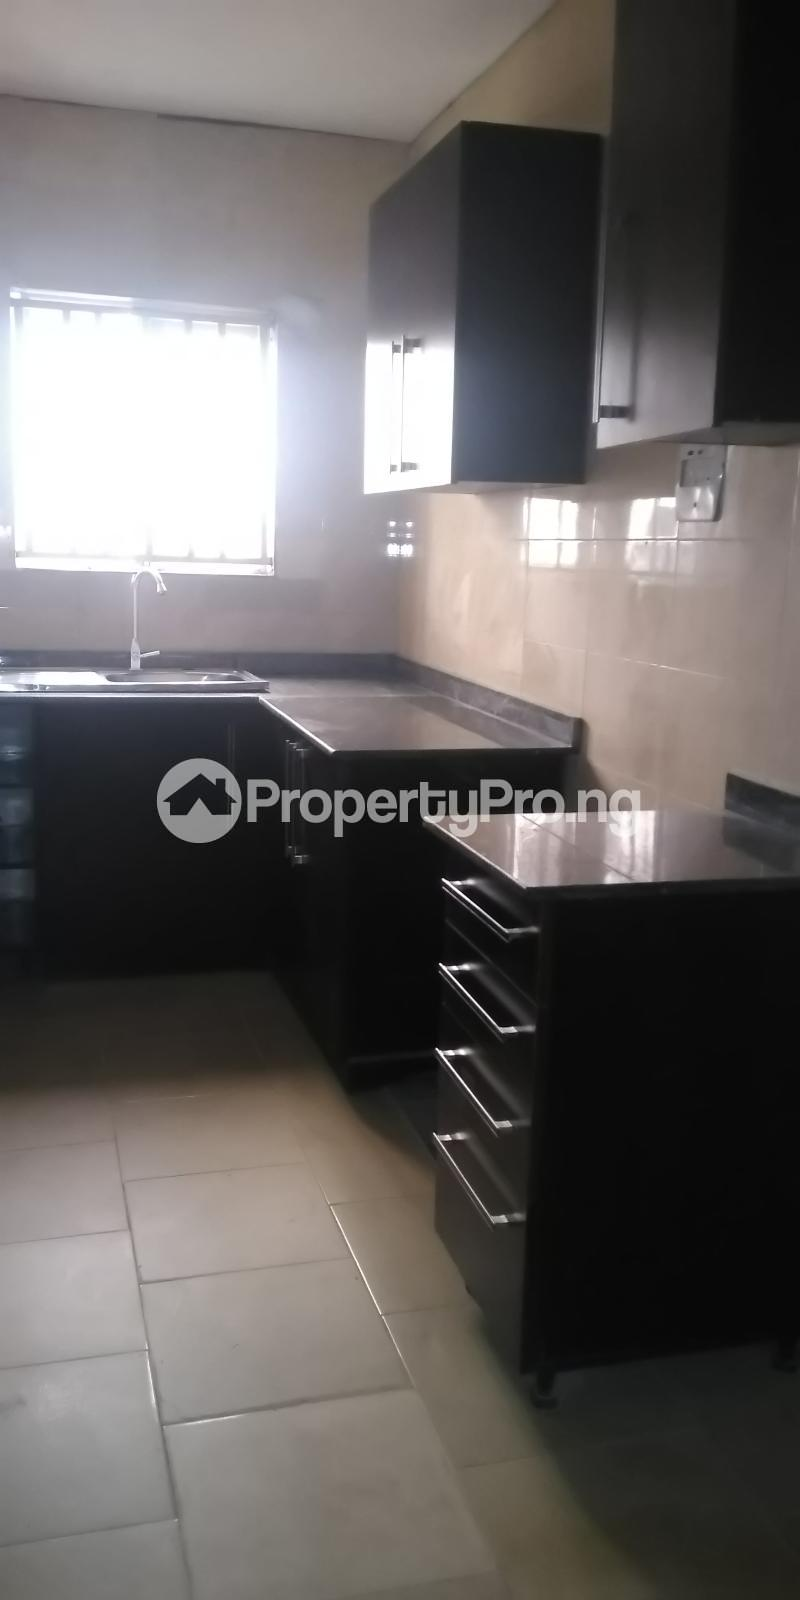 3 bedroom Flat / Apartment for rent Ibukunolu  Akoka Yaba Lagos - 12